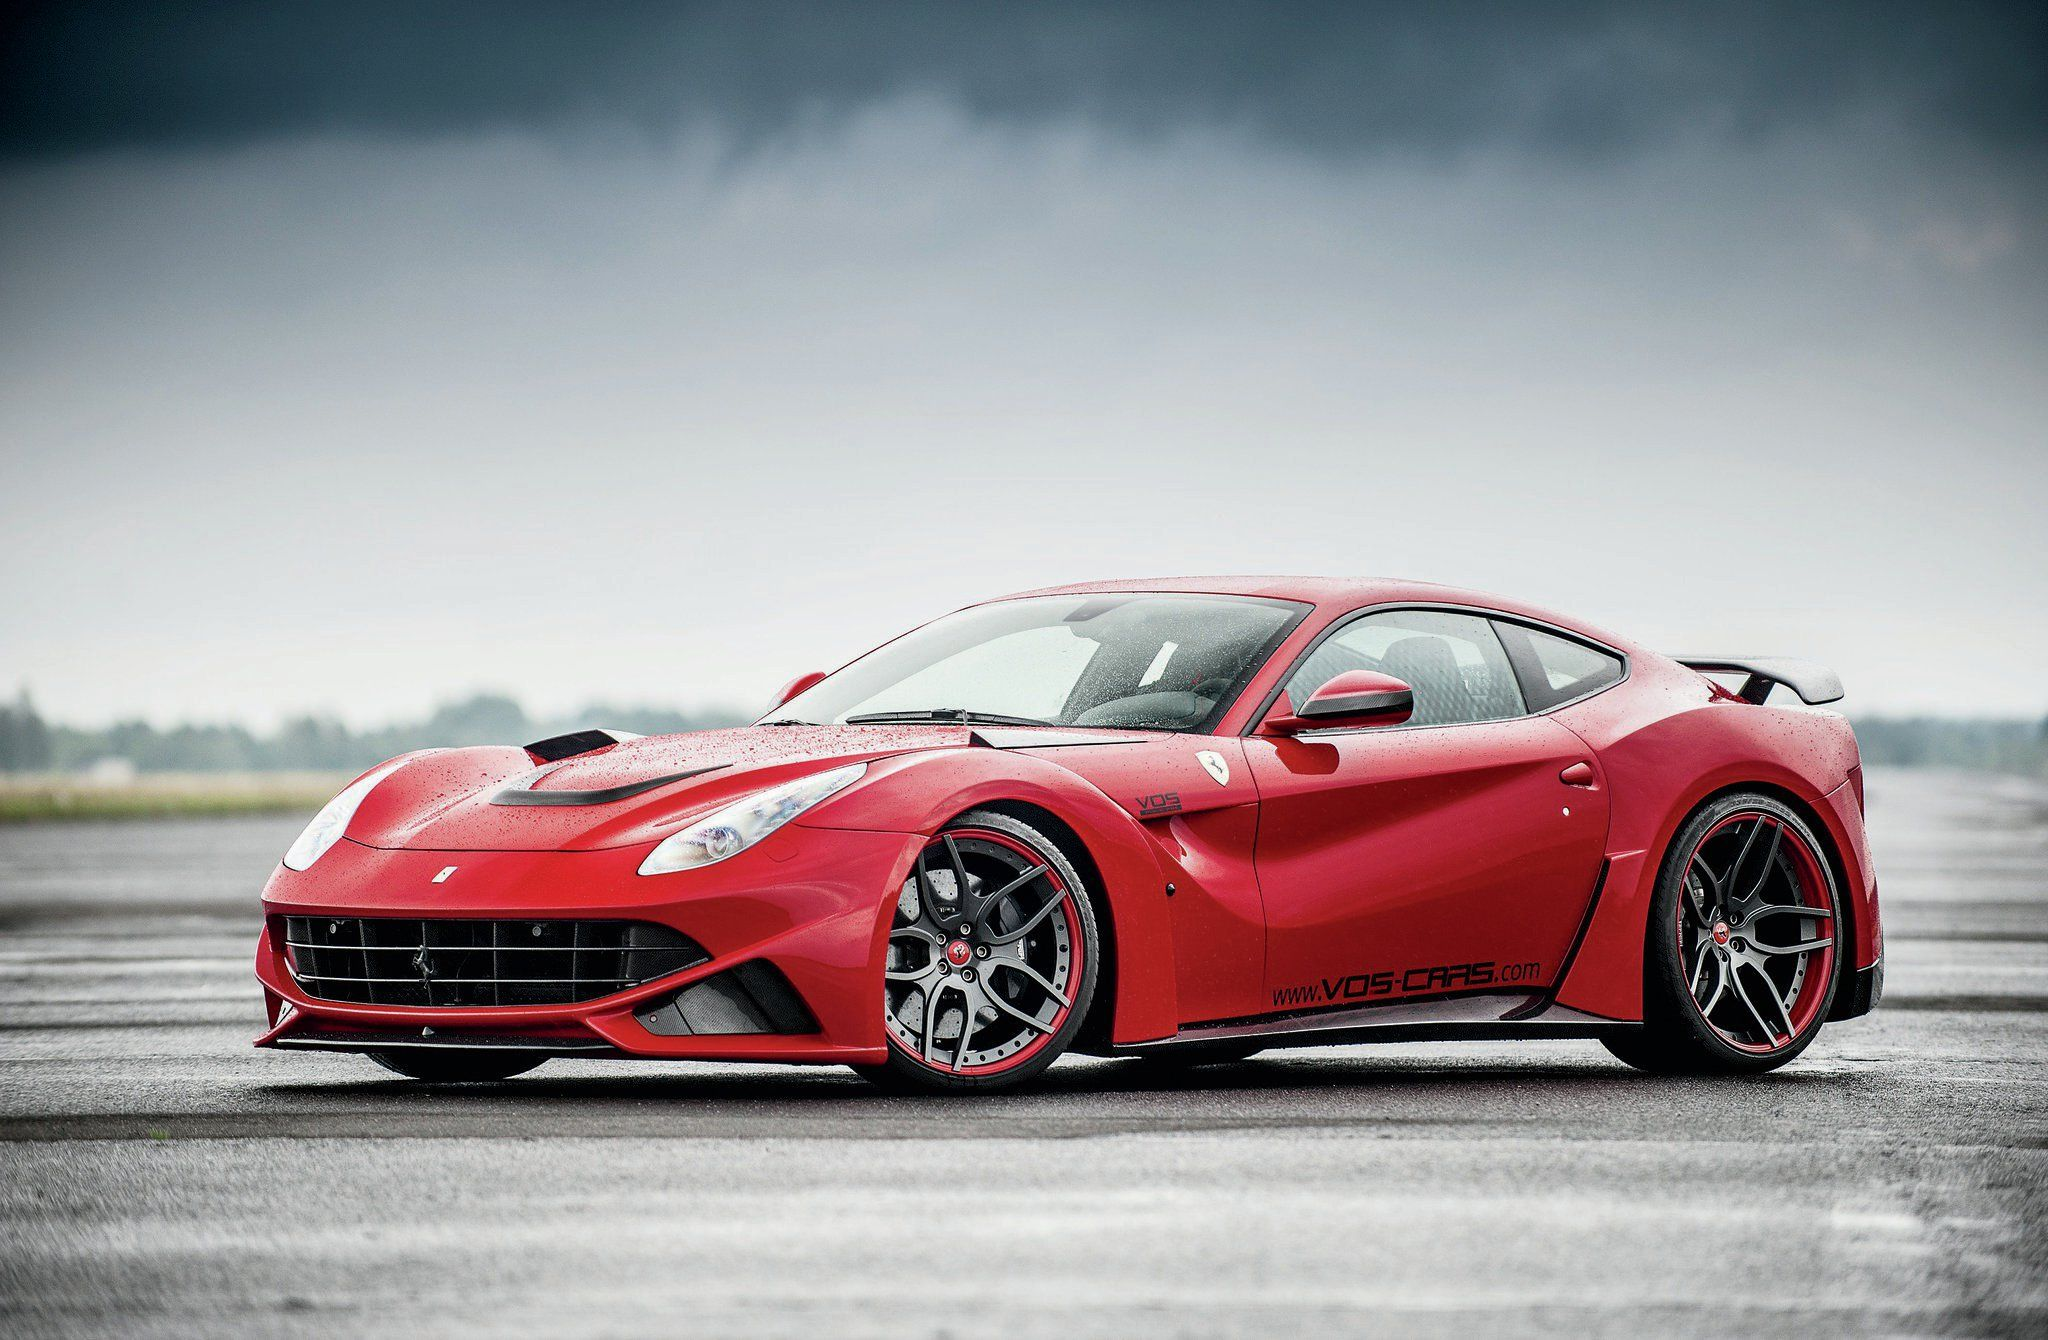 774hp novitec n-largo ferrari f12 - red alert | ferrari, cars and